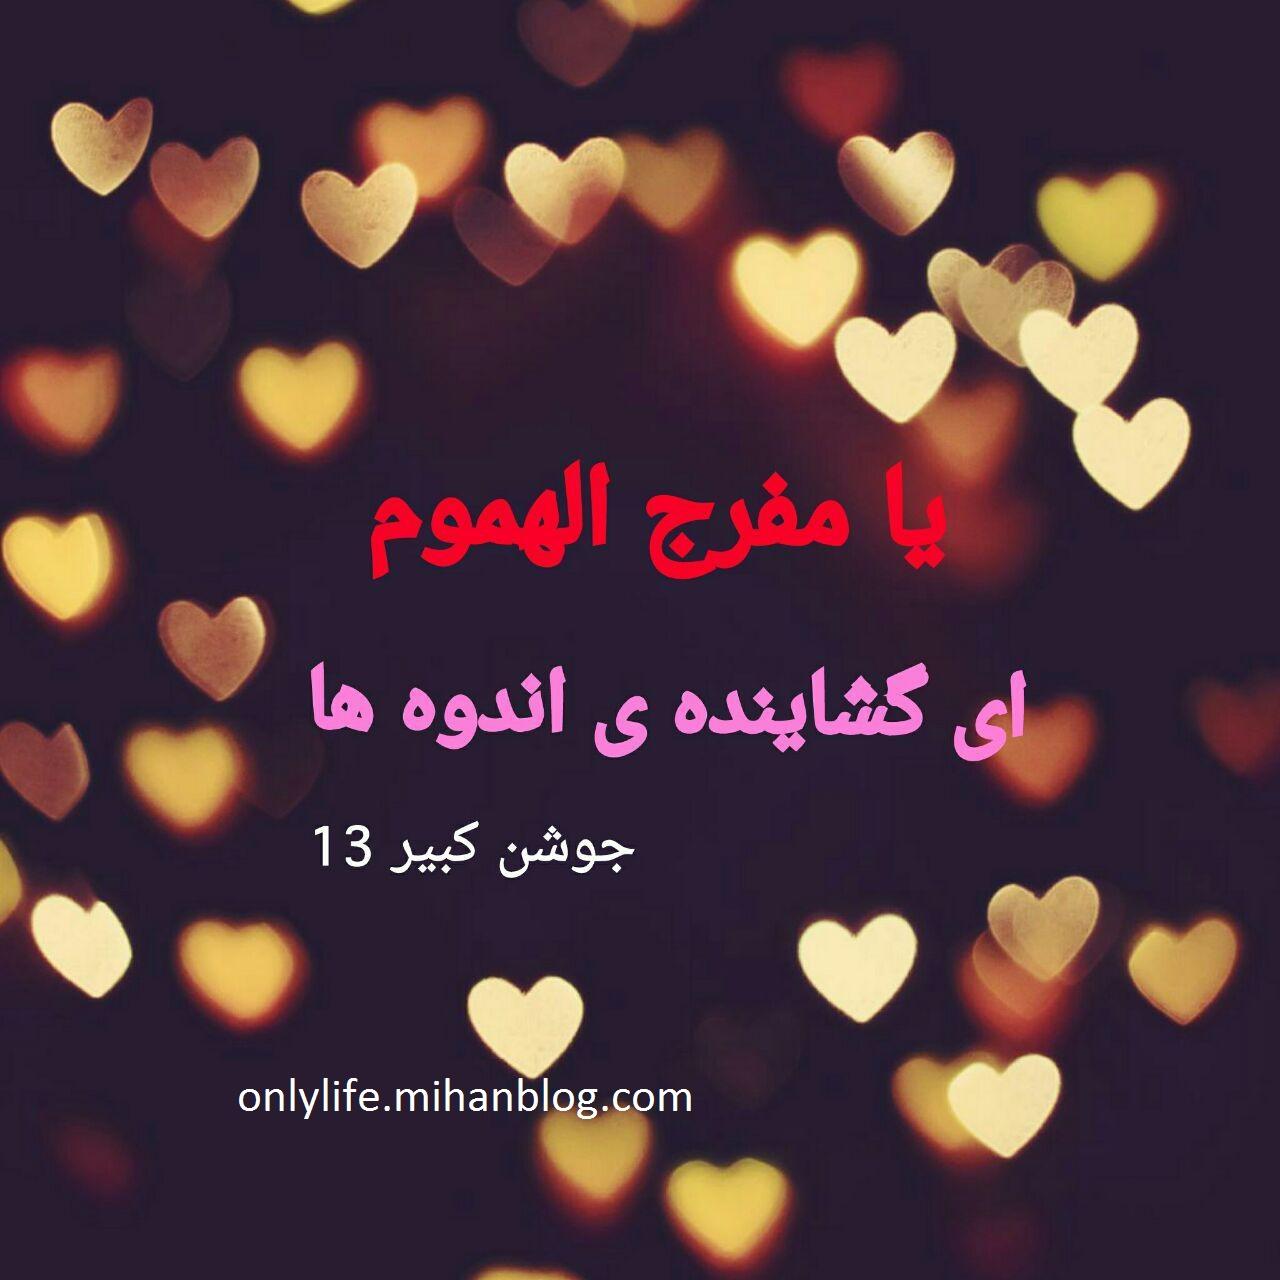 http://s3.picofile.com/file/8194744284/Khoda.jpg